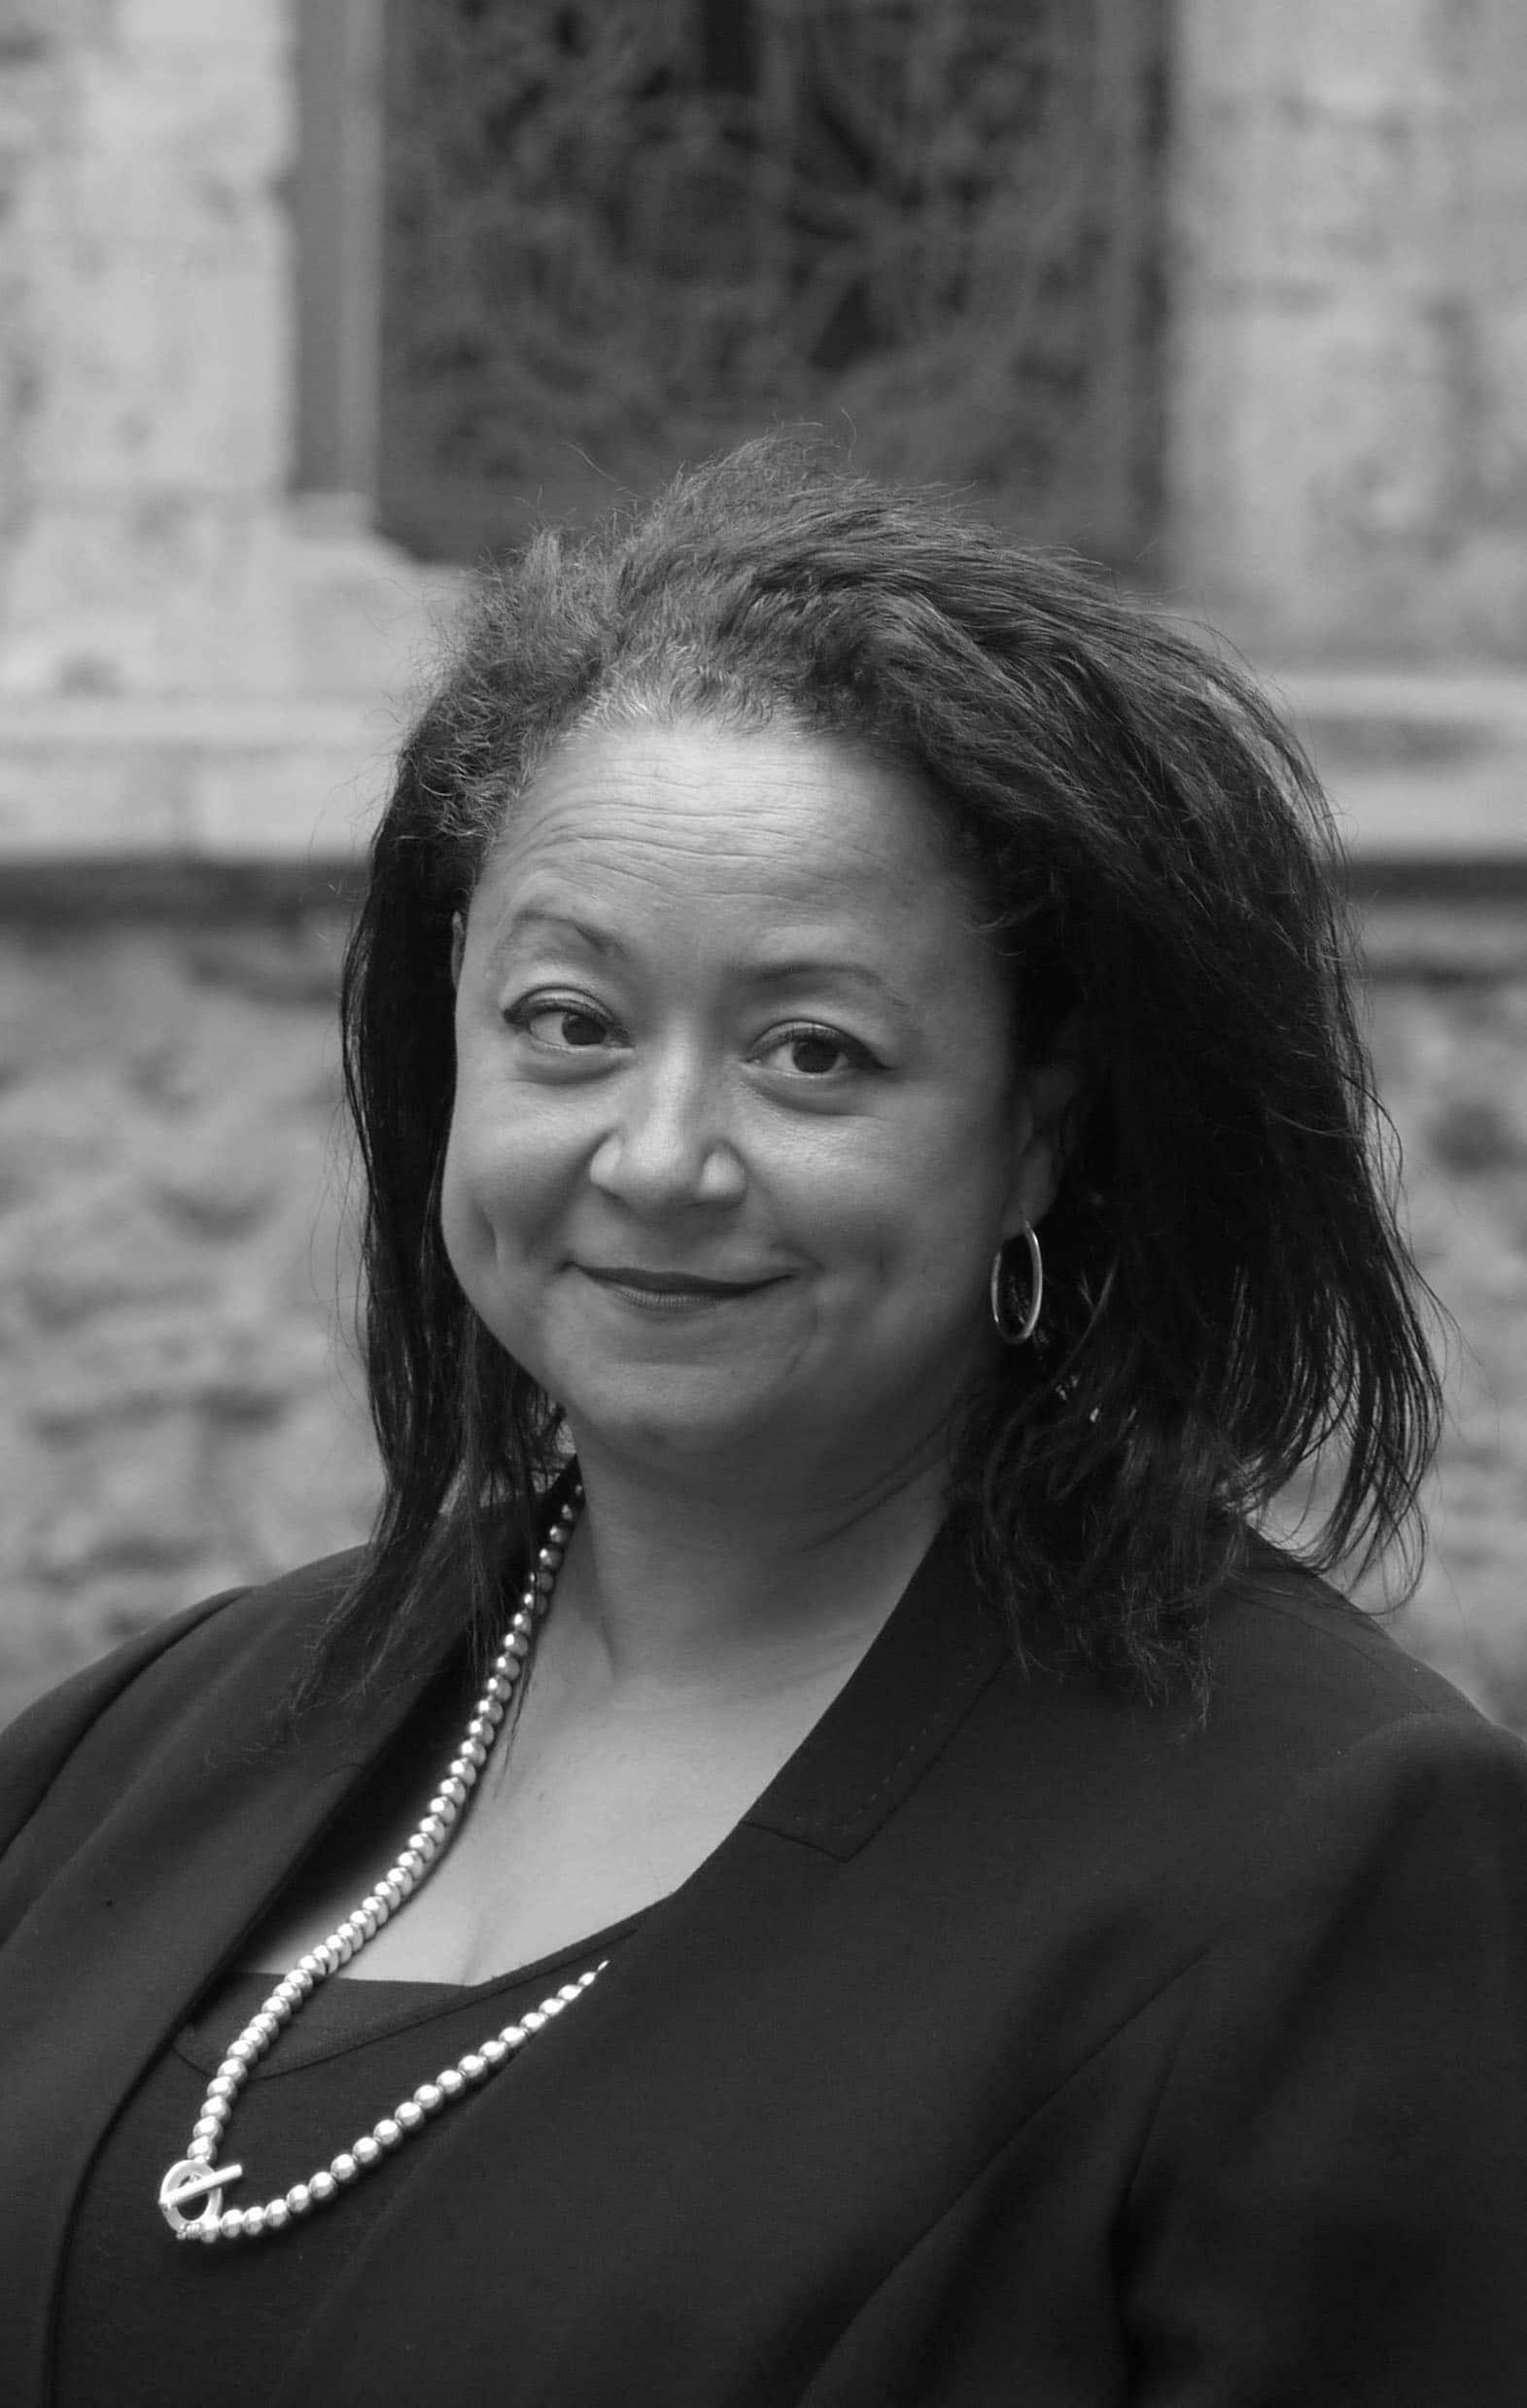 Paula Bignall